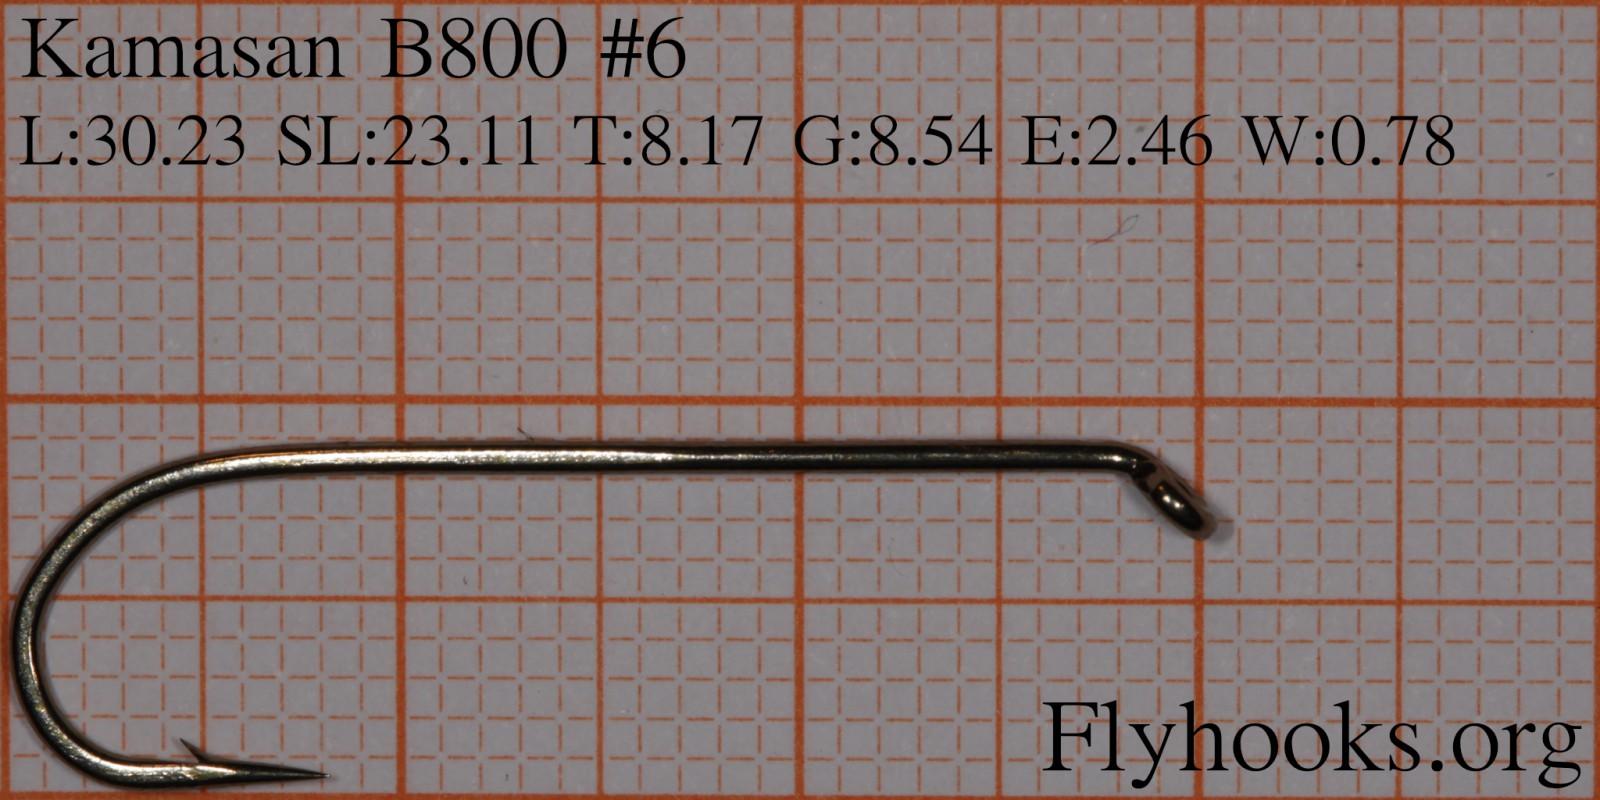 #6 Fly Hooks 25 Pack Kamasan B800 Round Bend Lure